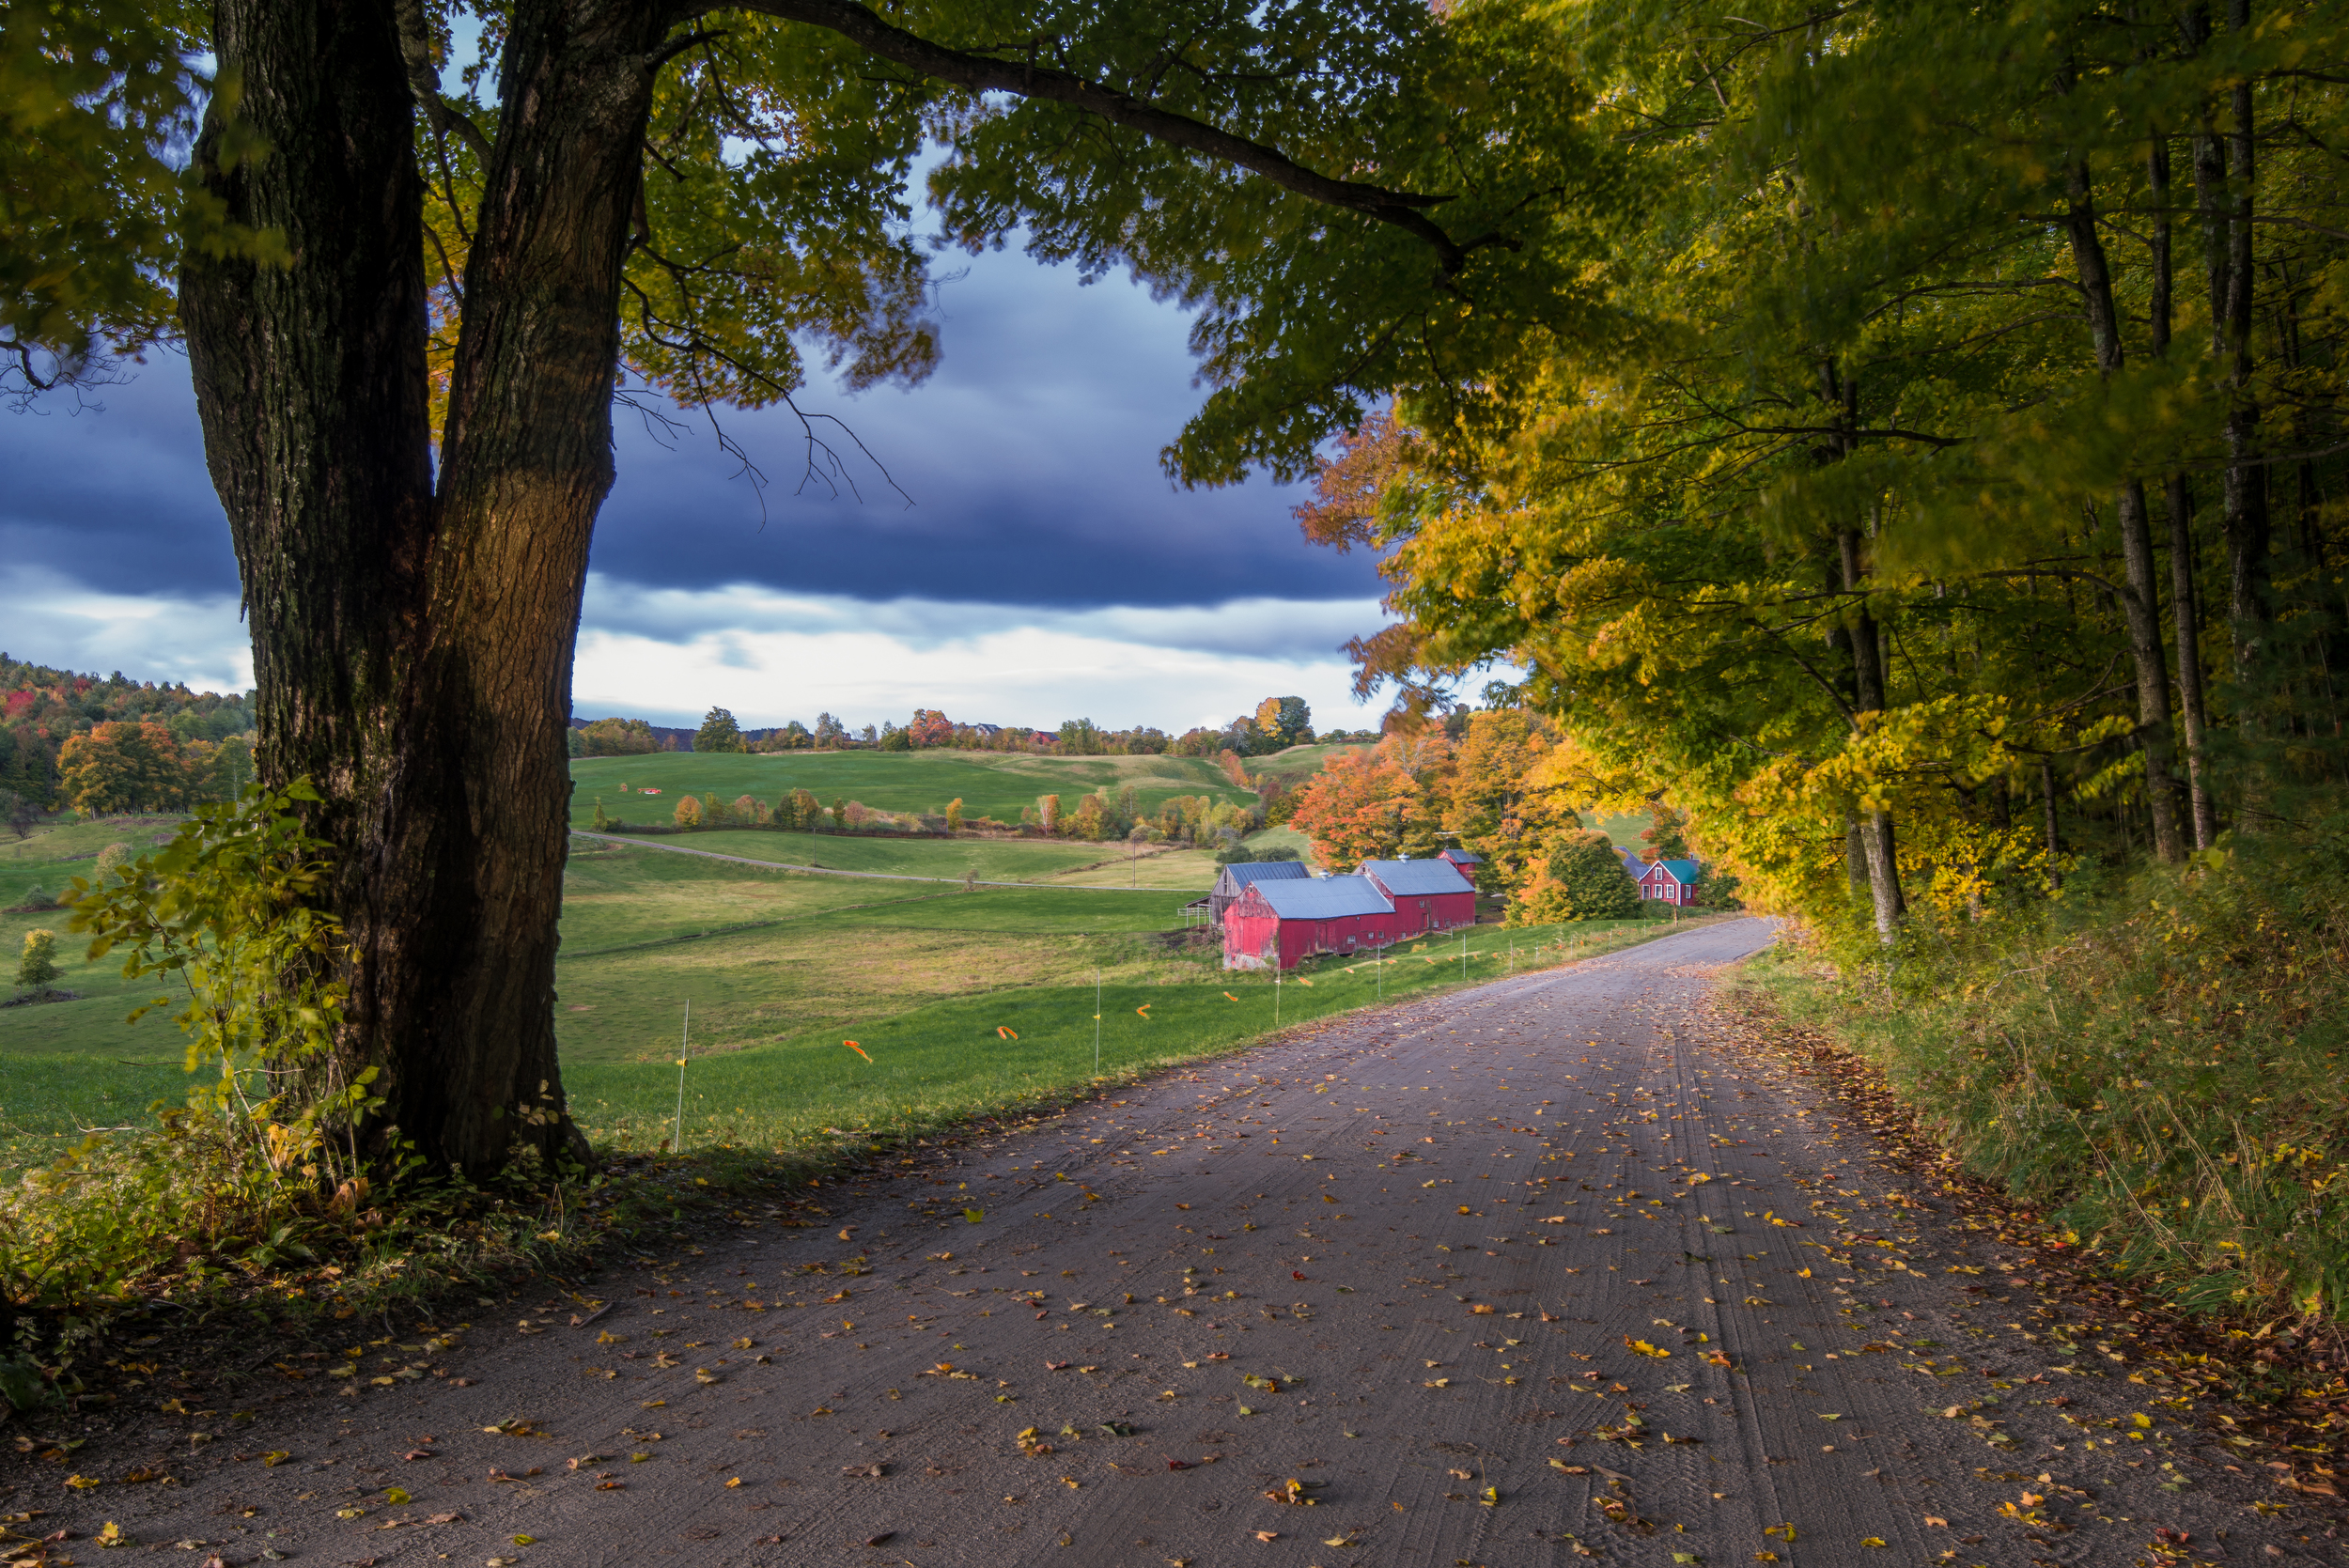 Vermont Farm in Autumn - 2